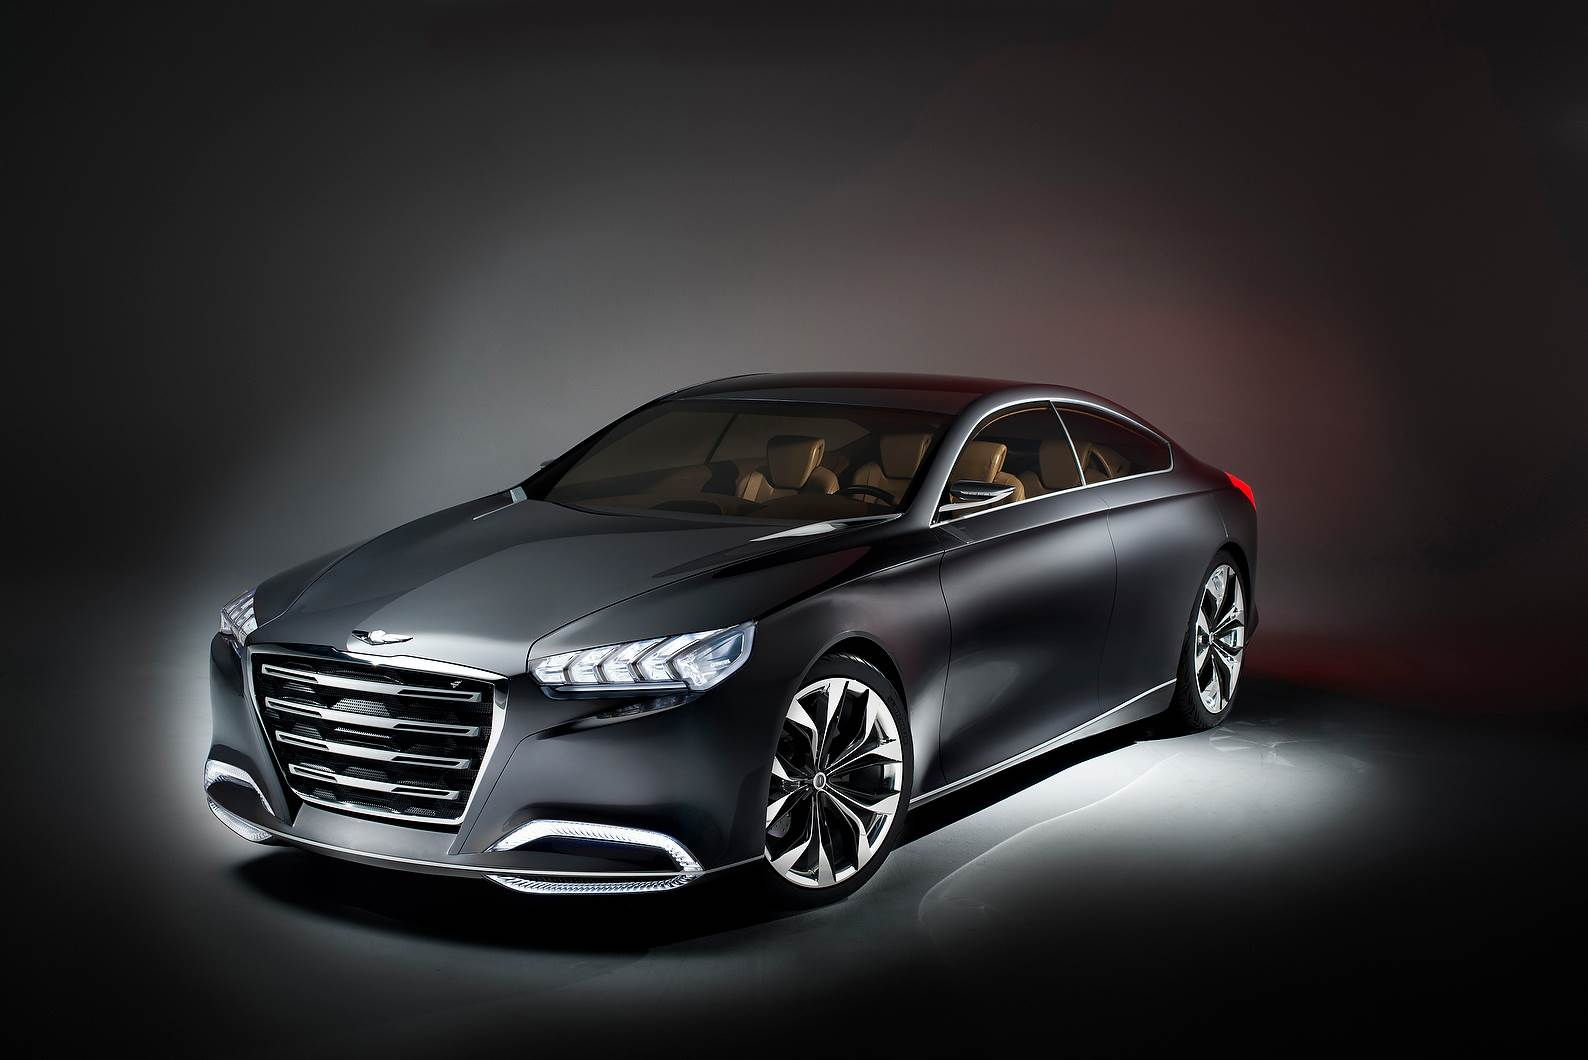 Hyundai shows HCD-14 Genesis concept